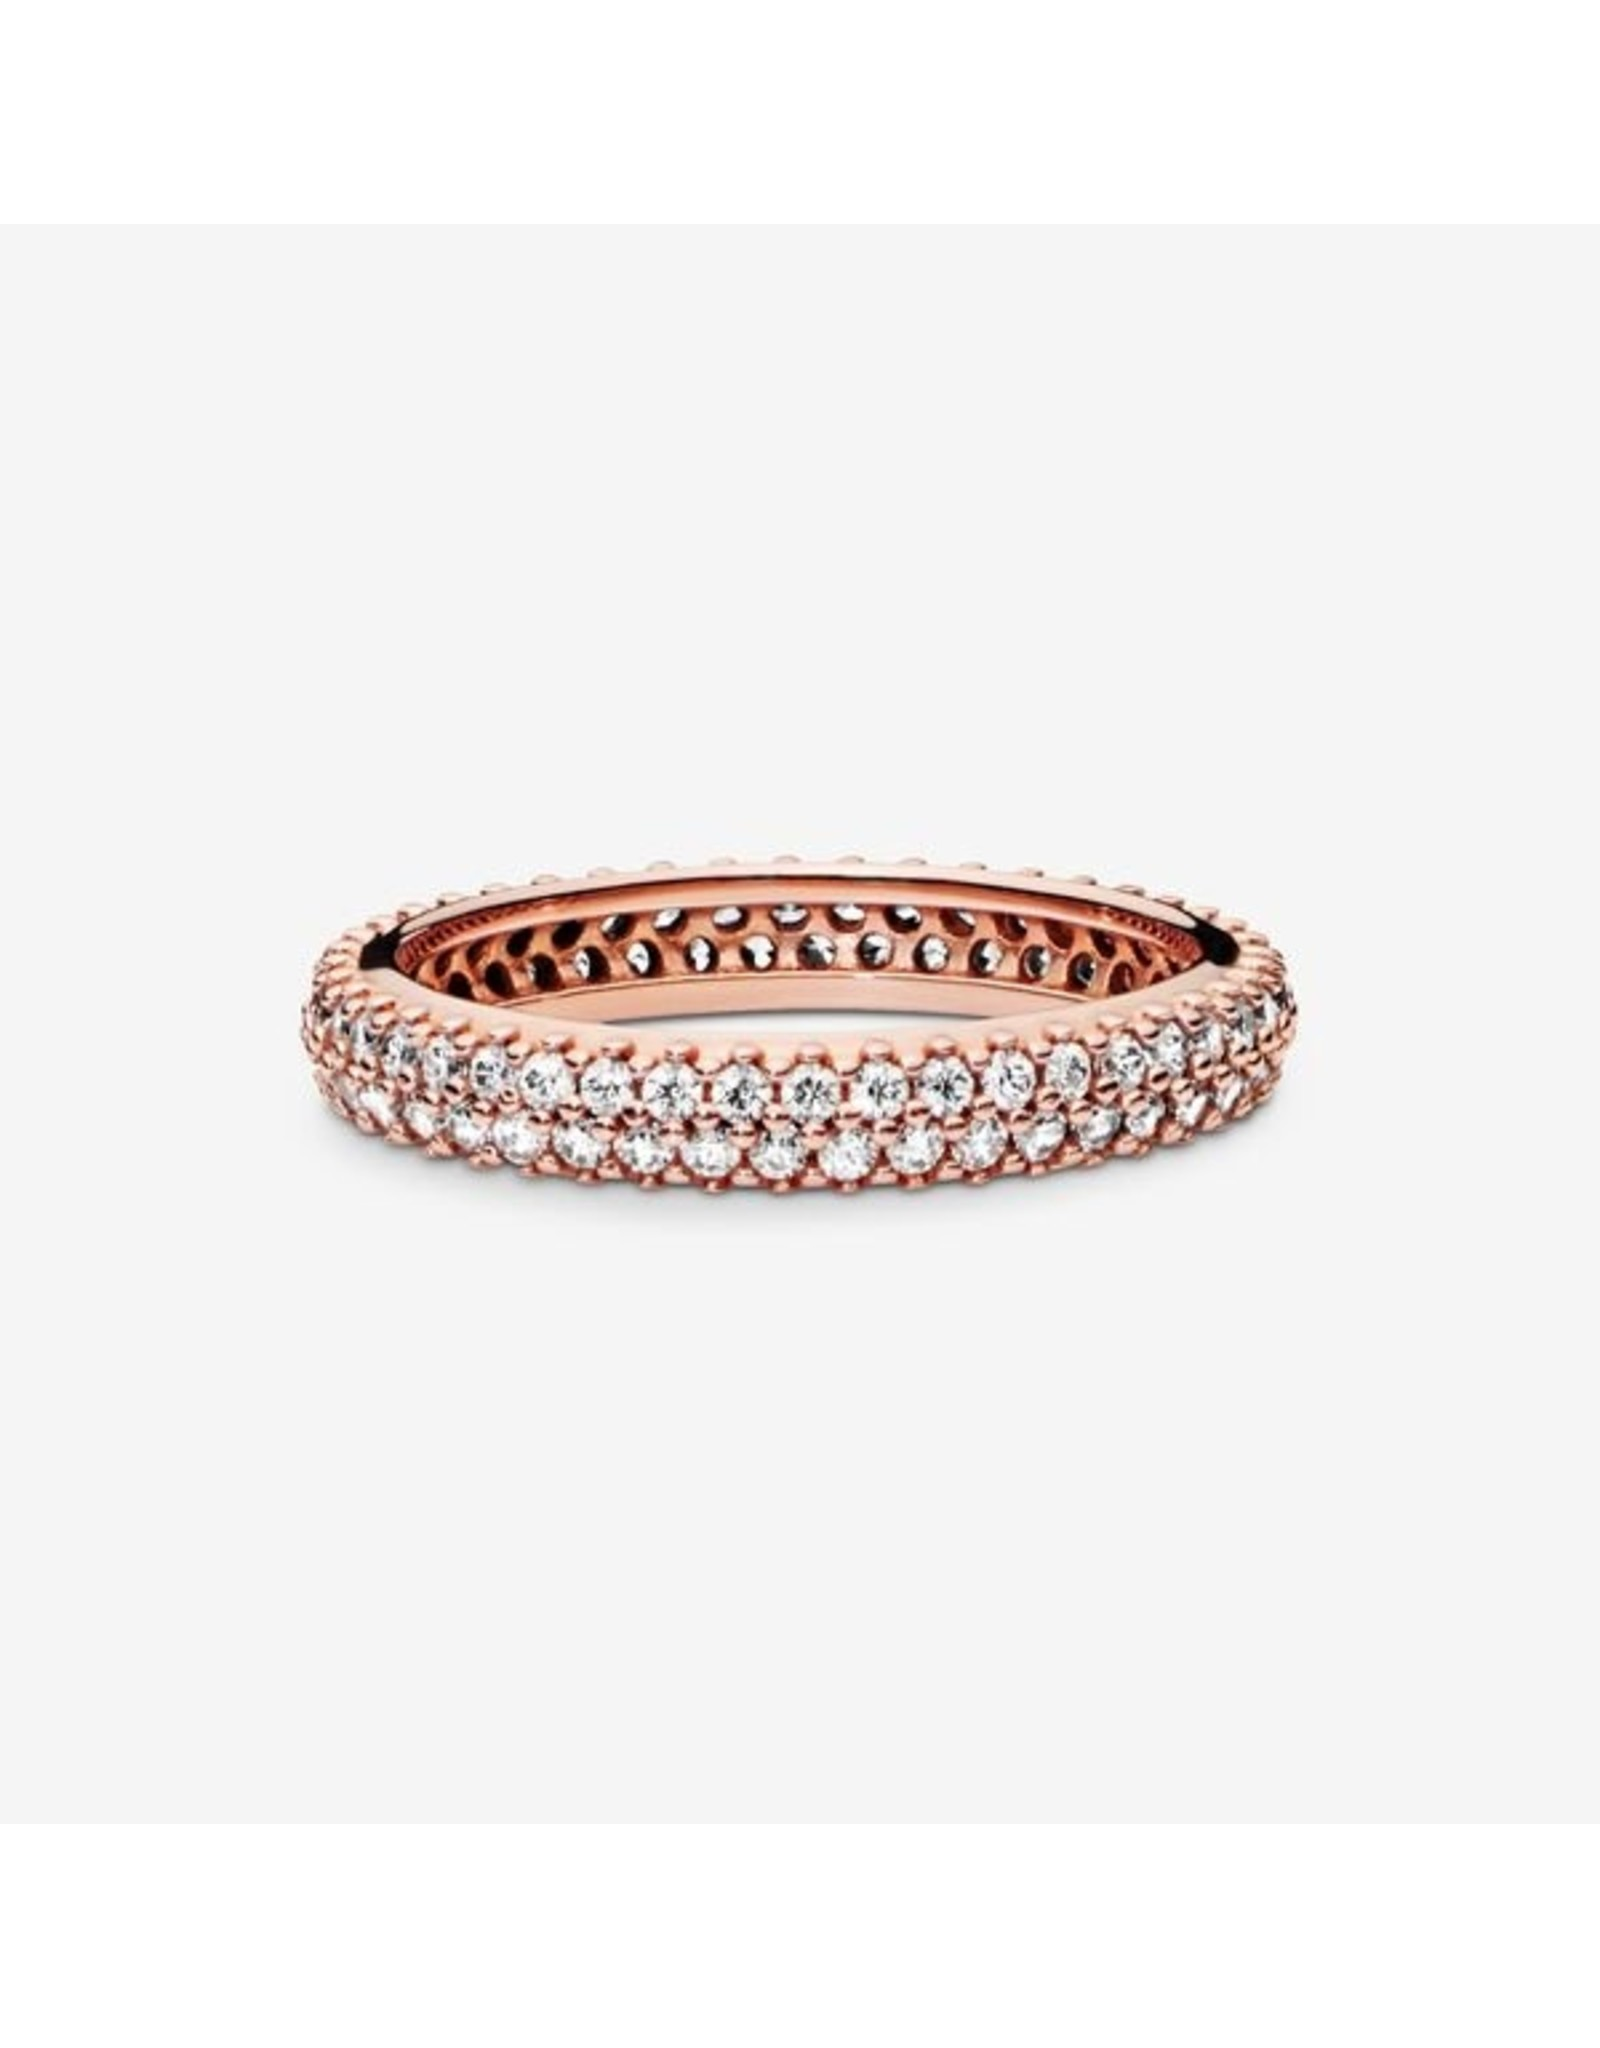 Pandora Pandora Ring, (180909CZ) Rose Gold, Inspiration Within, Clear CZ